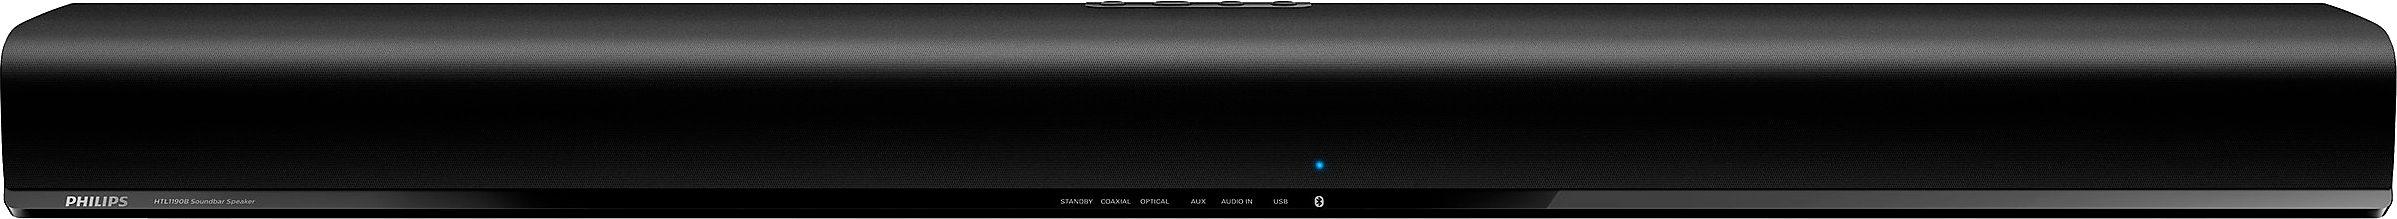 Philips HTL1190B 2.0 Soundbar mit Bluetooth